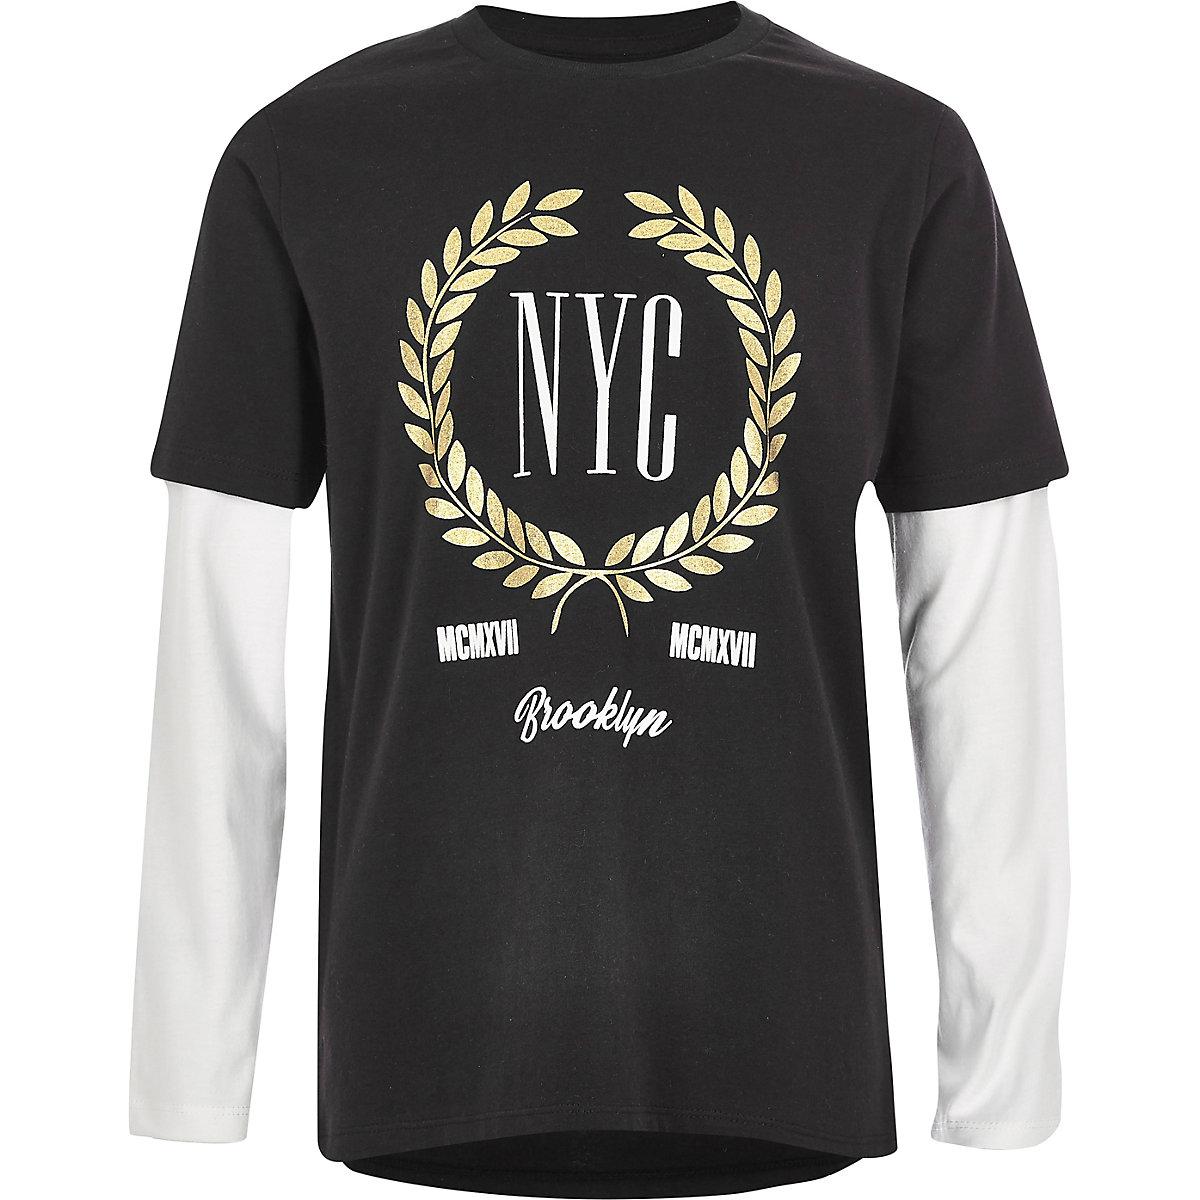 Boys black 'NYC' double sleeve T-shirt